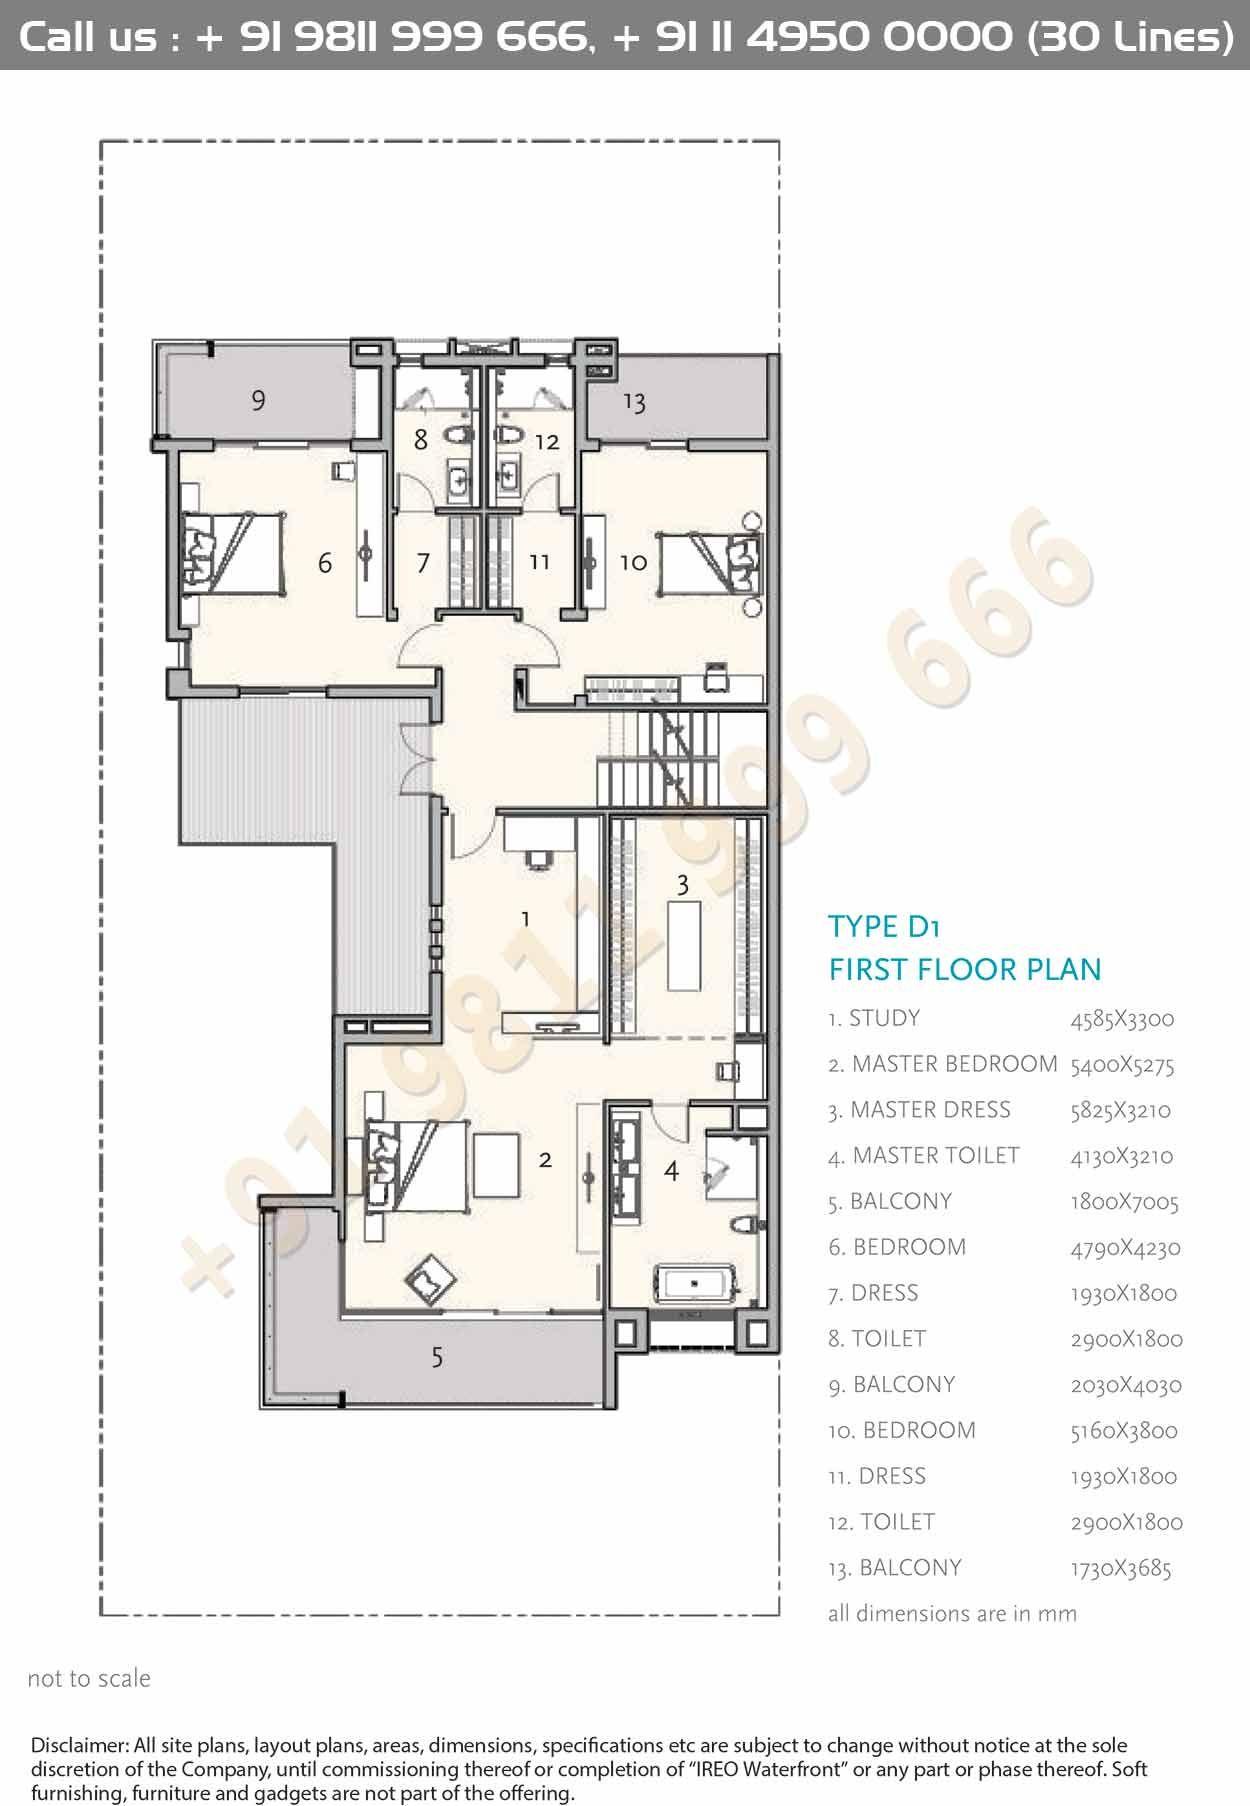 Type D1 First Floor Plan Floor Plans House Construction Plan Apartment Floor Plans